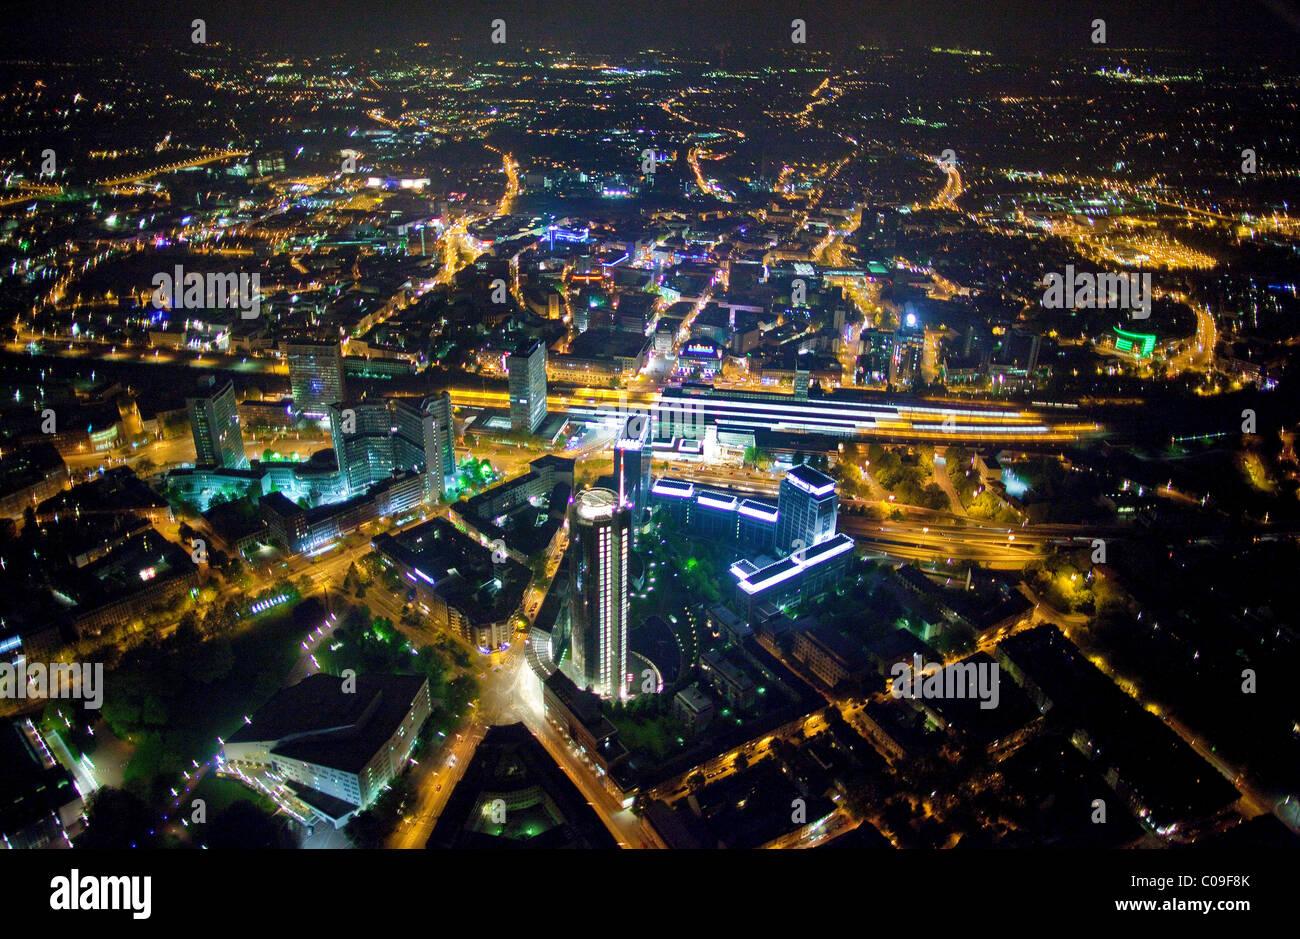 Aerial view, night shot, Saalbau Essen philharmonic hall, Aalto Theater and RWE Tower, Essen, Ruhrgebiet region Stock Photo